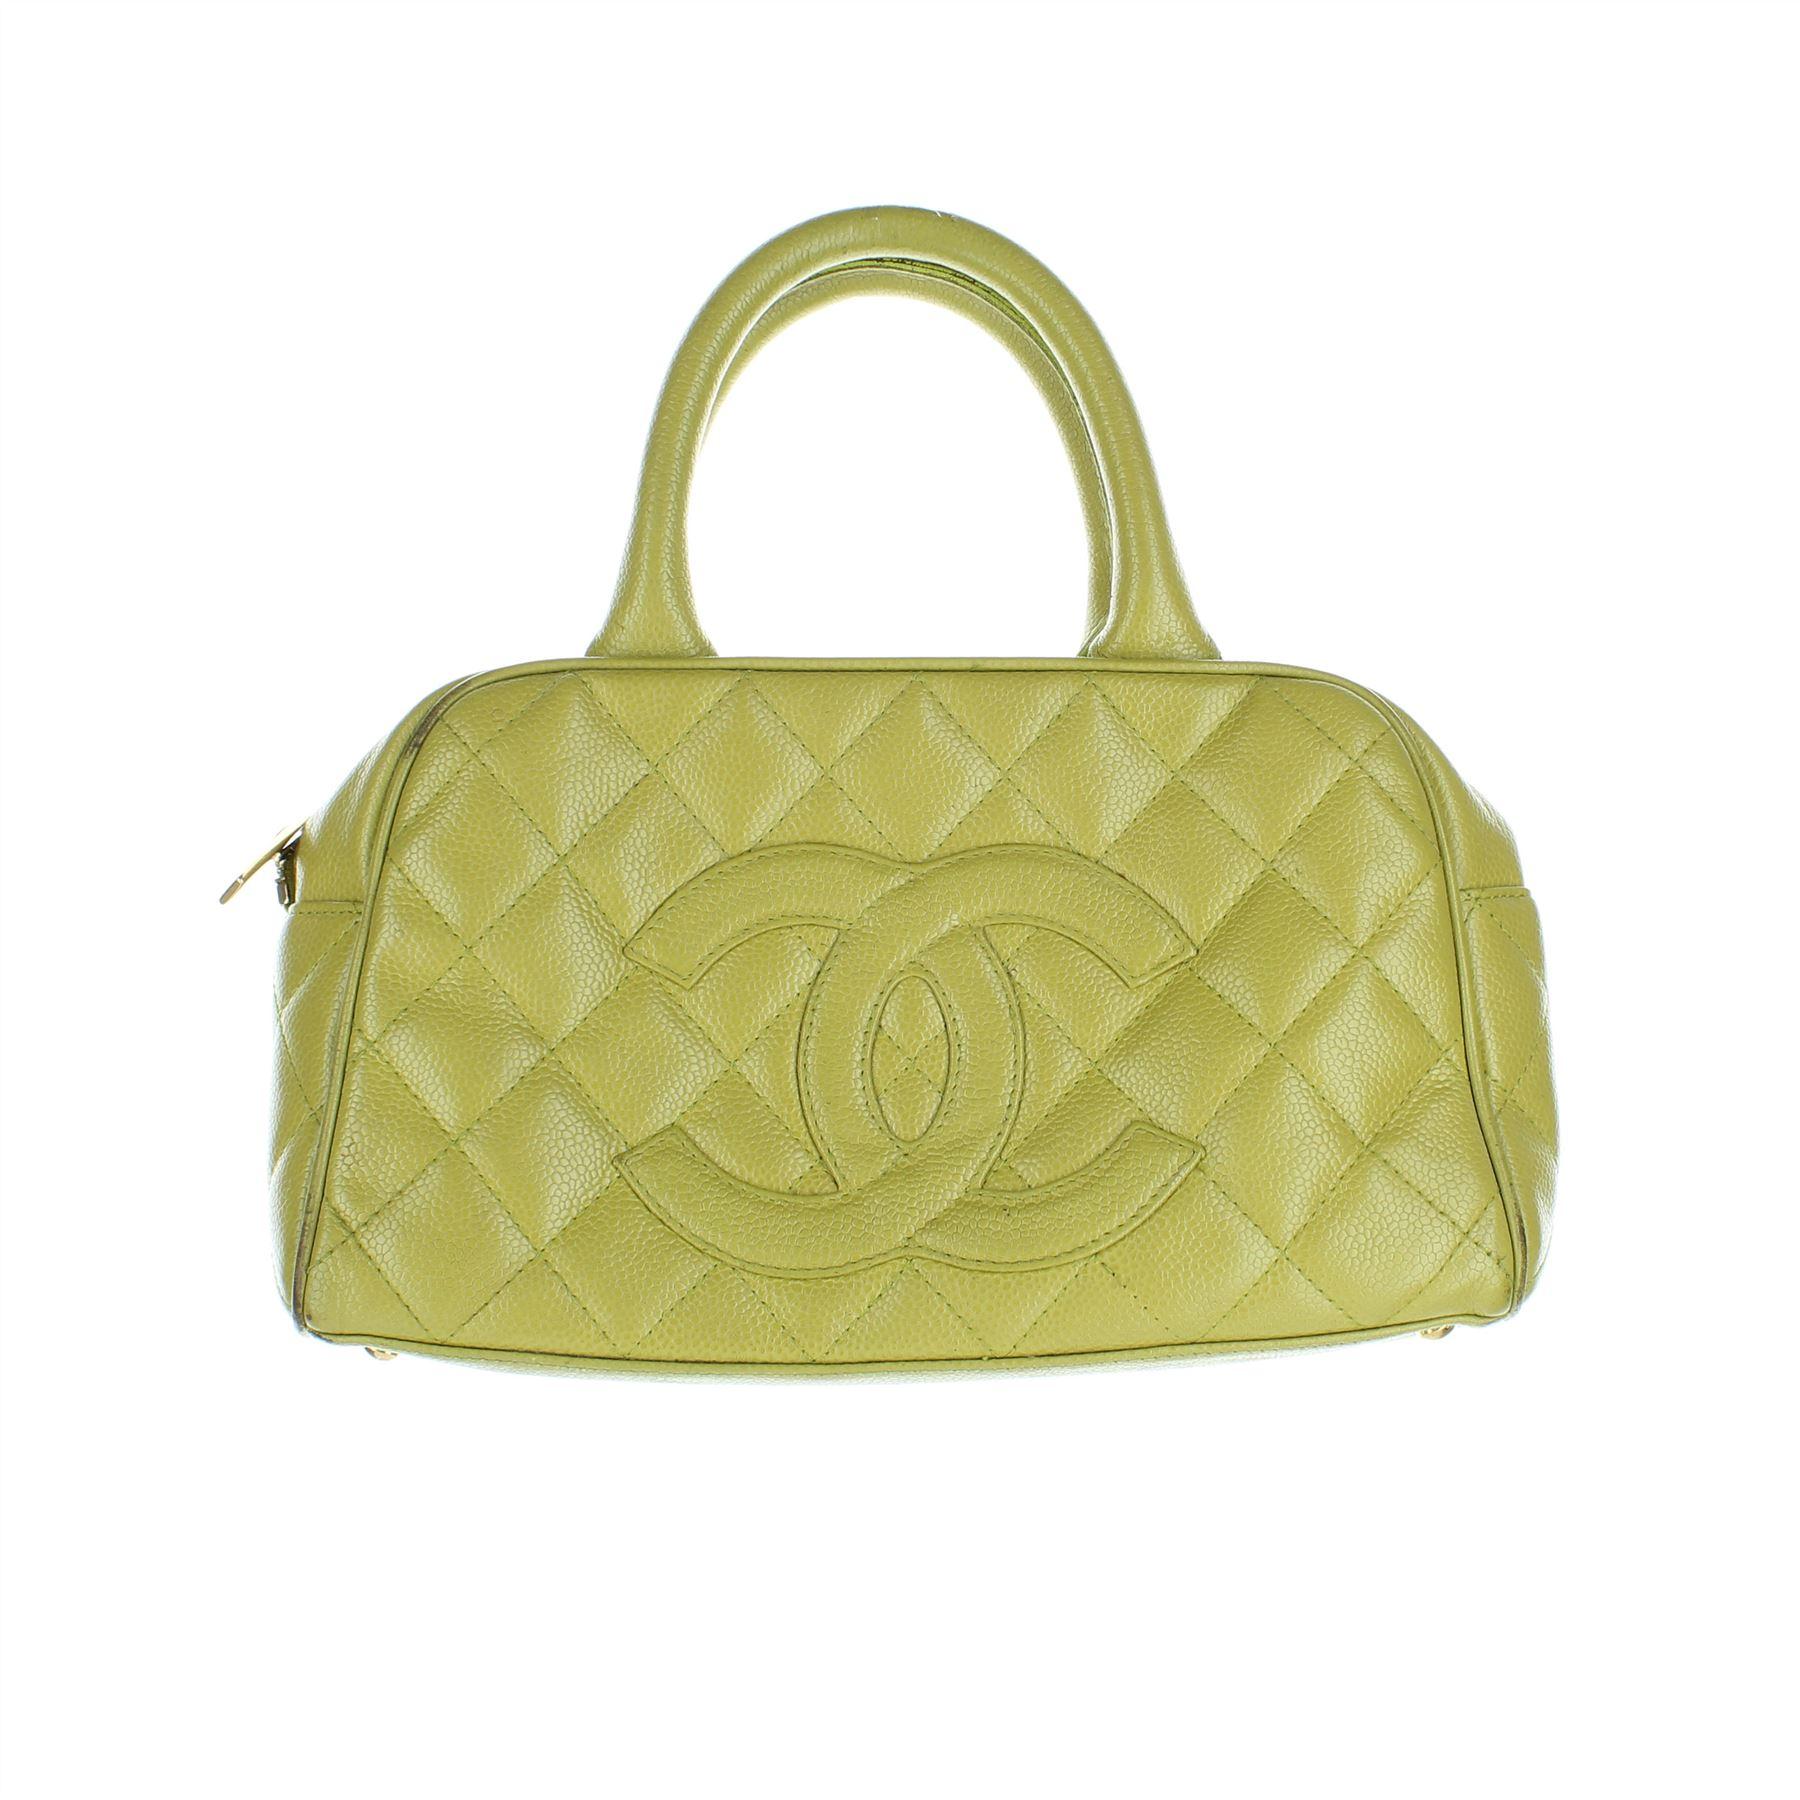 ba3c0e4f2 CHANEL Caviar Bowler Green Leather Handbag, 6.25